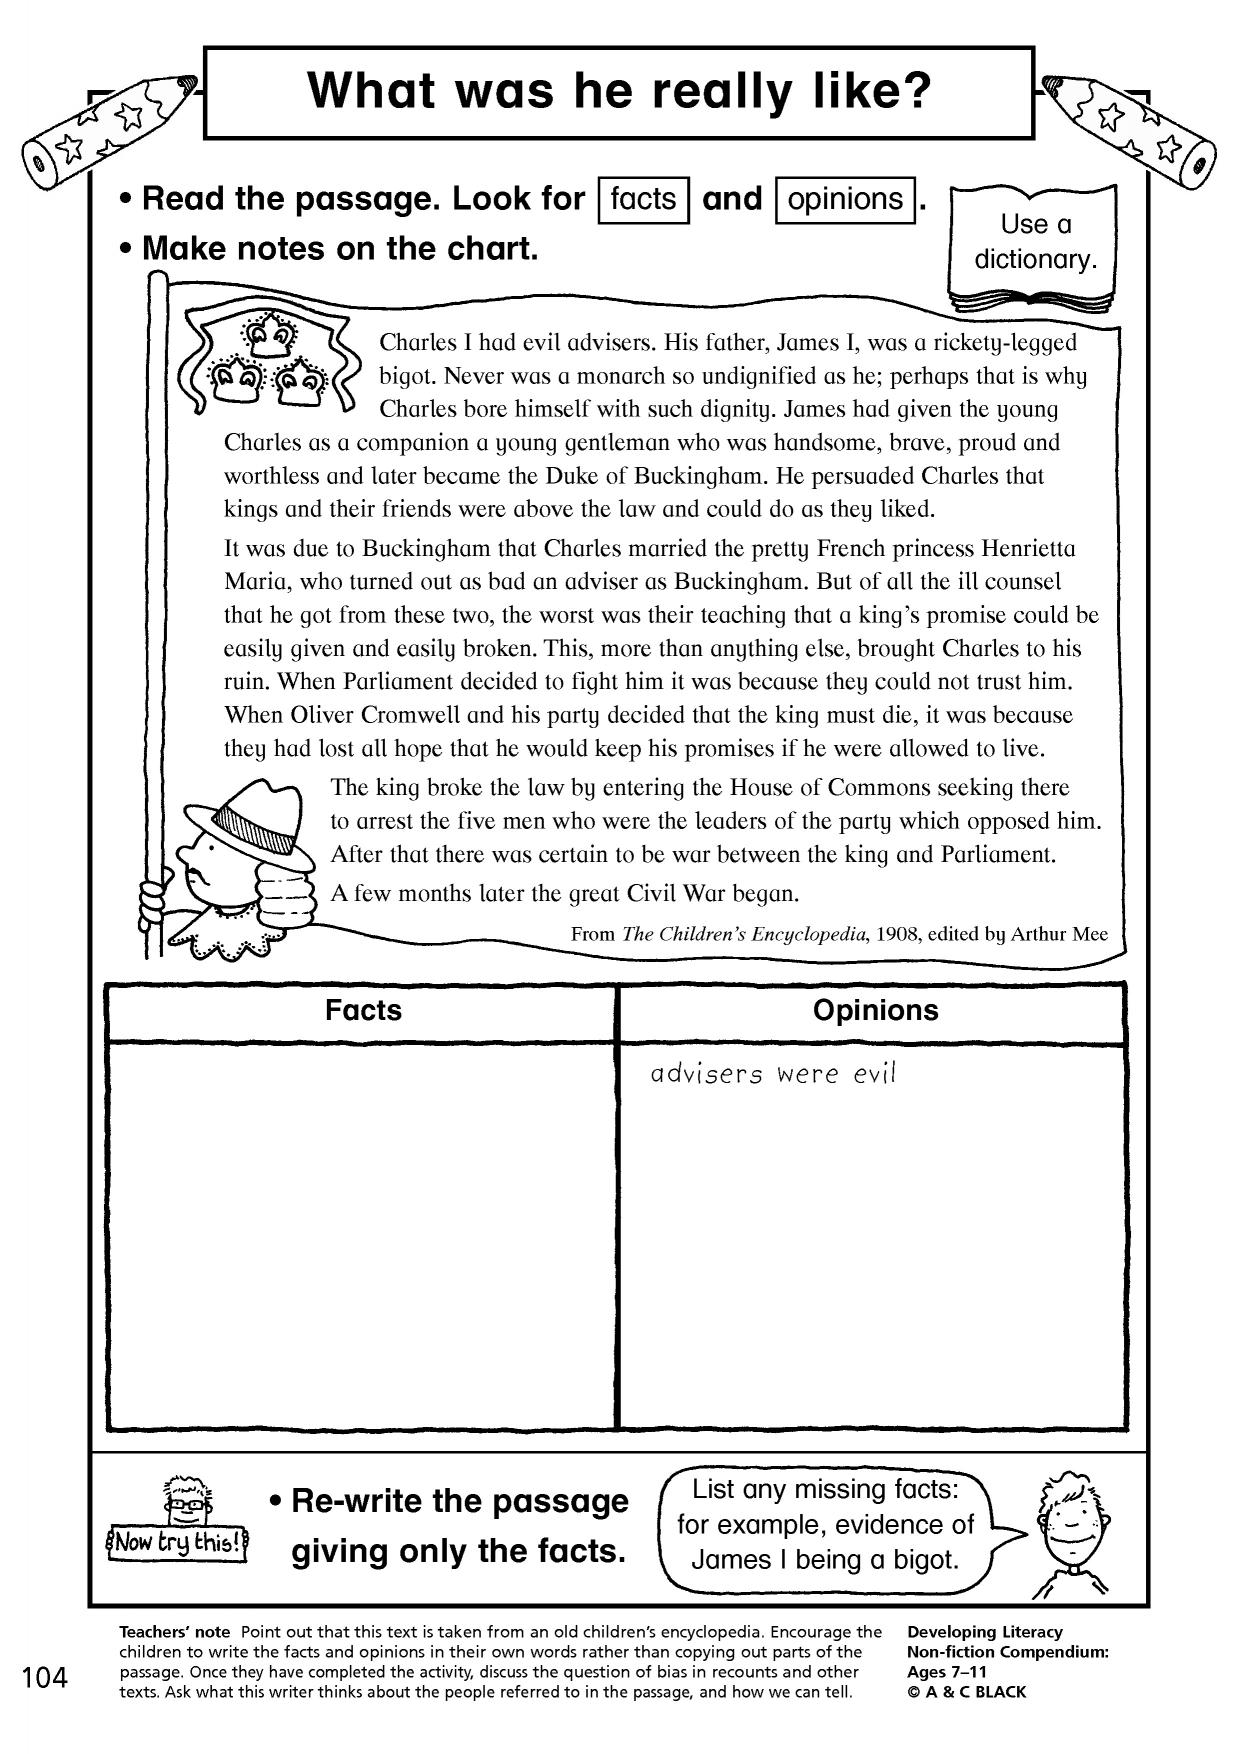 How to Write an Encyclopedia